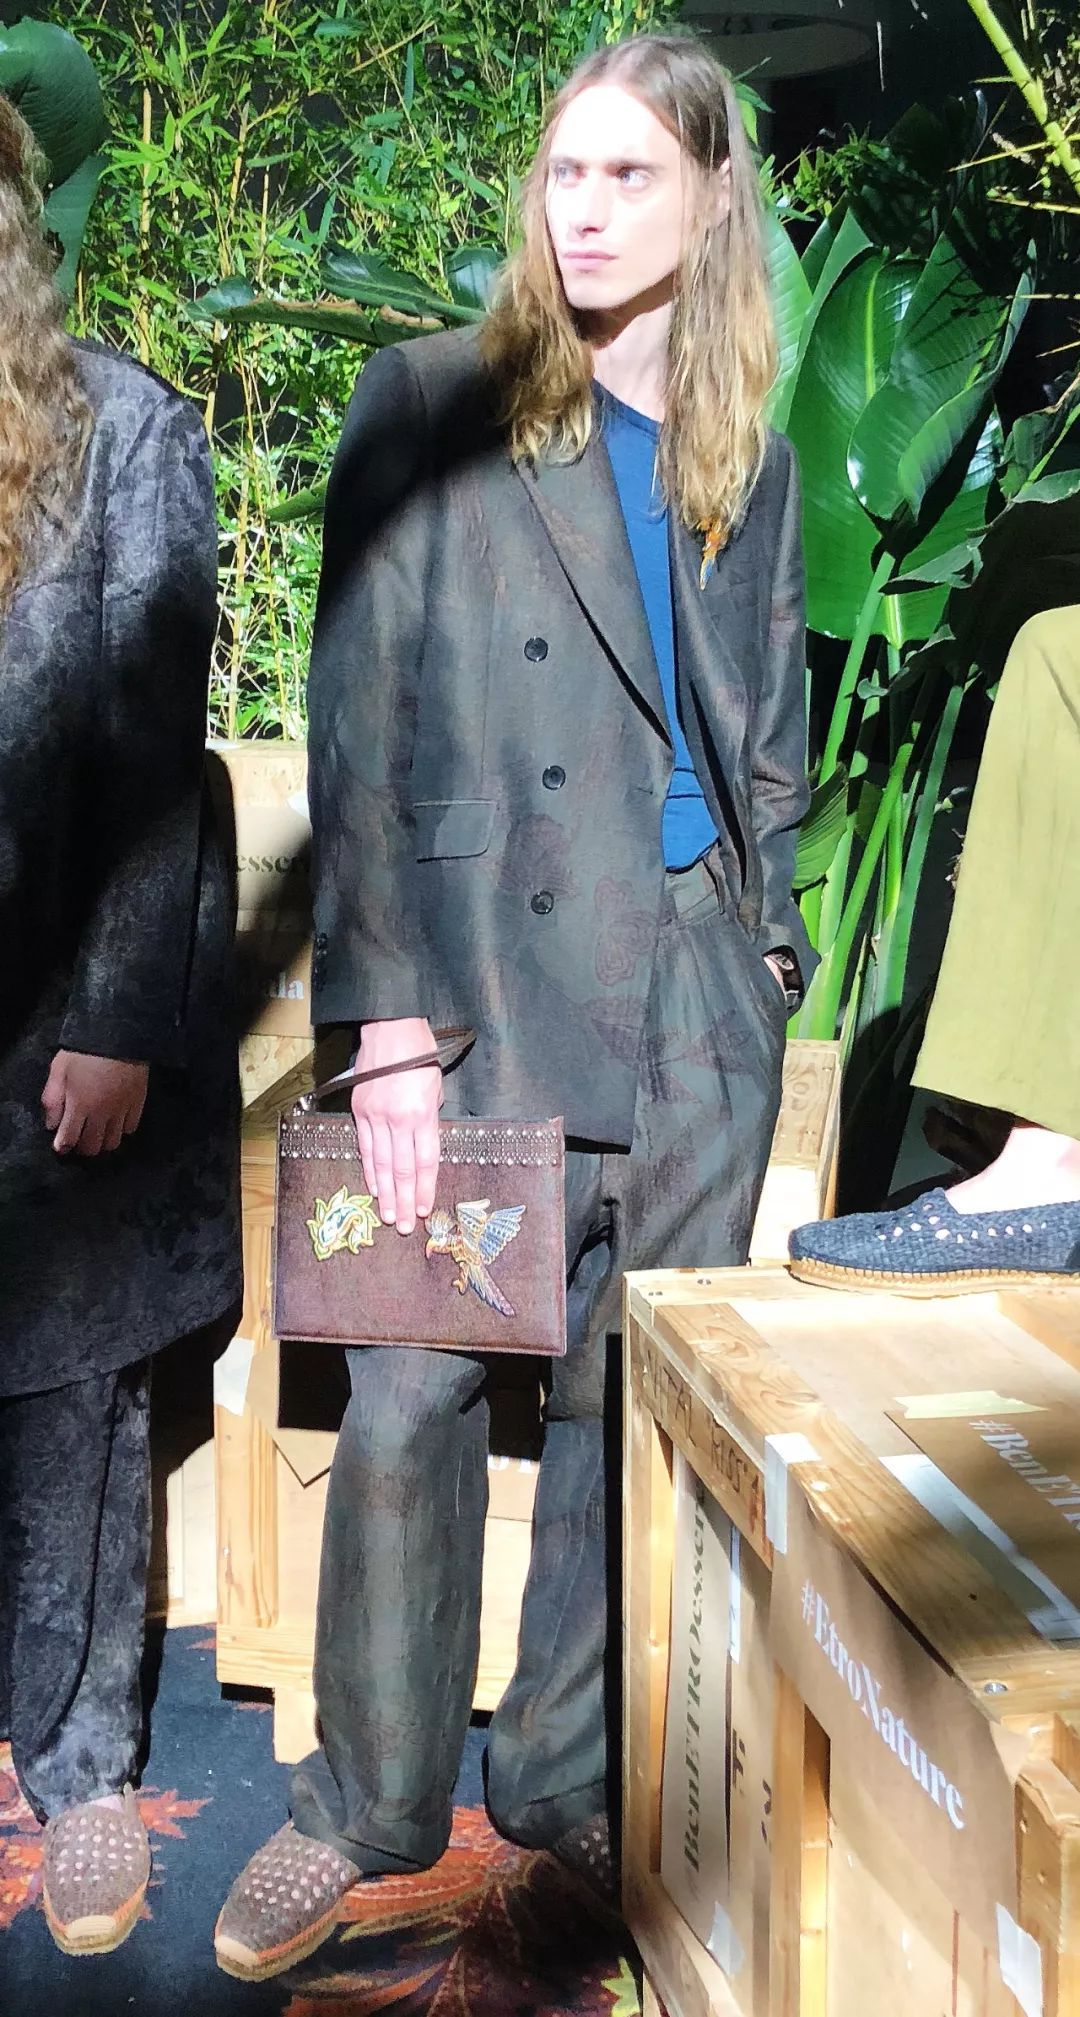 "Prada明年流行""基本款"",Armani灰把优雅穿进骨子里,少了Fendi这件单品你就歇着吧!"